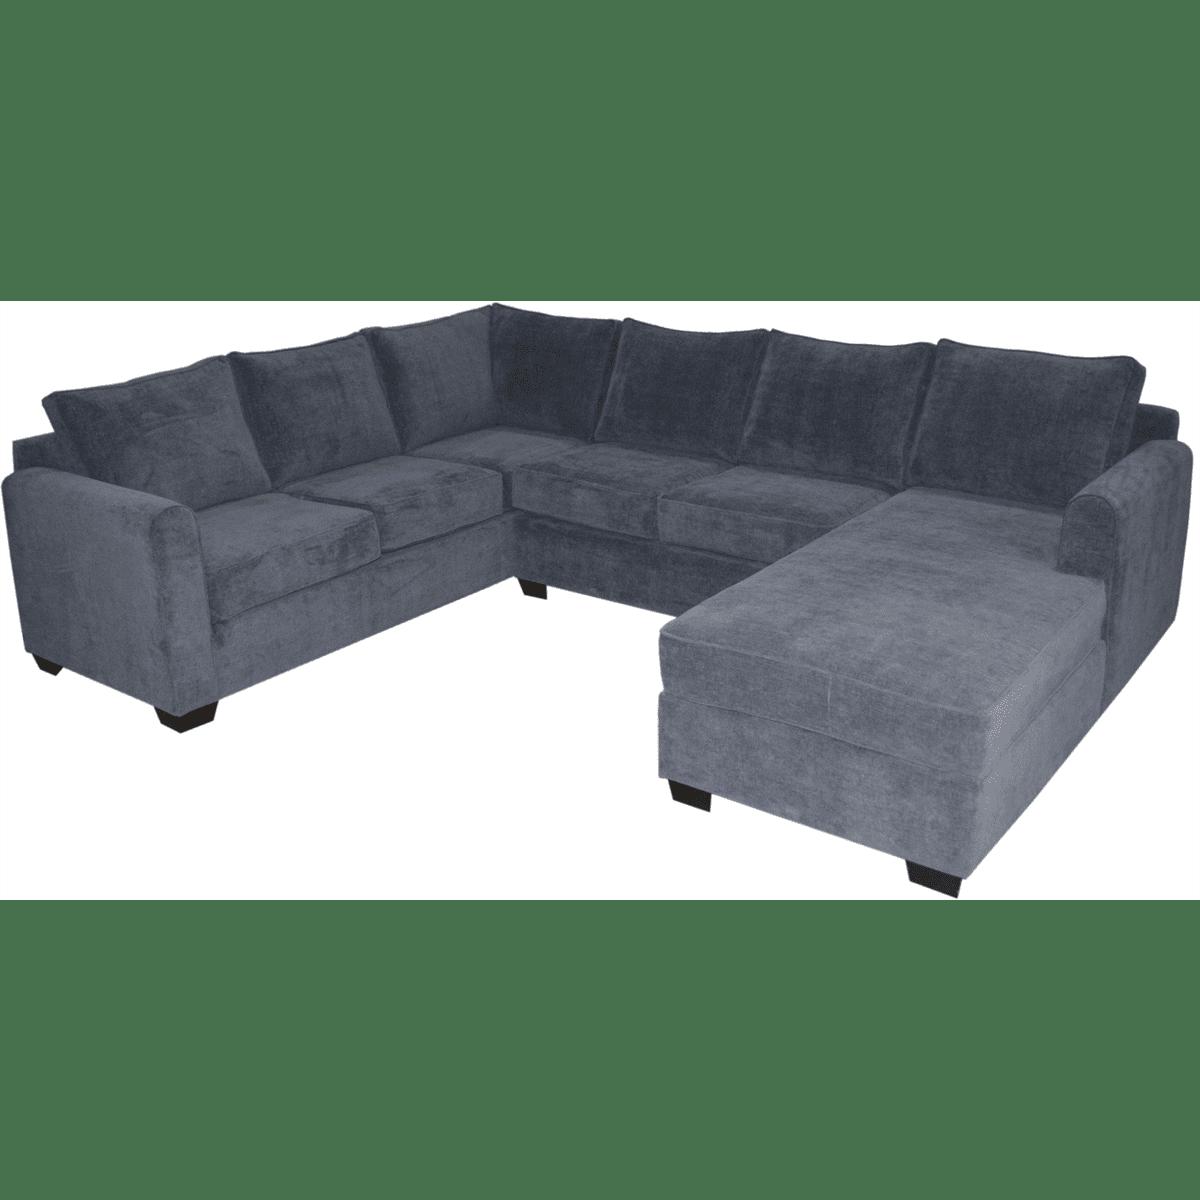 2022 Model Custom Made Sectional Sofa Condo Love